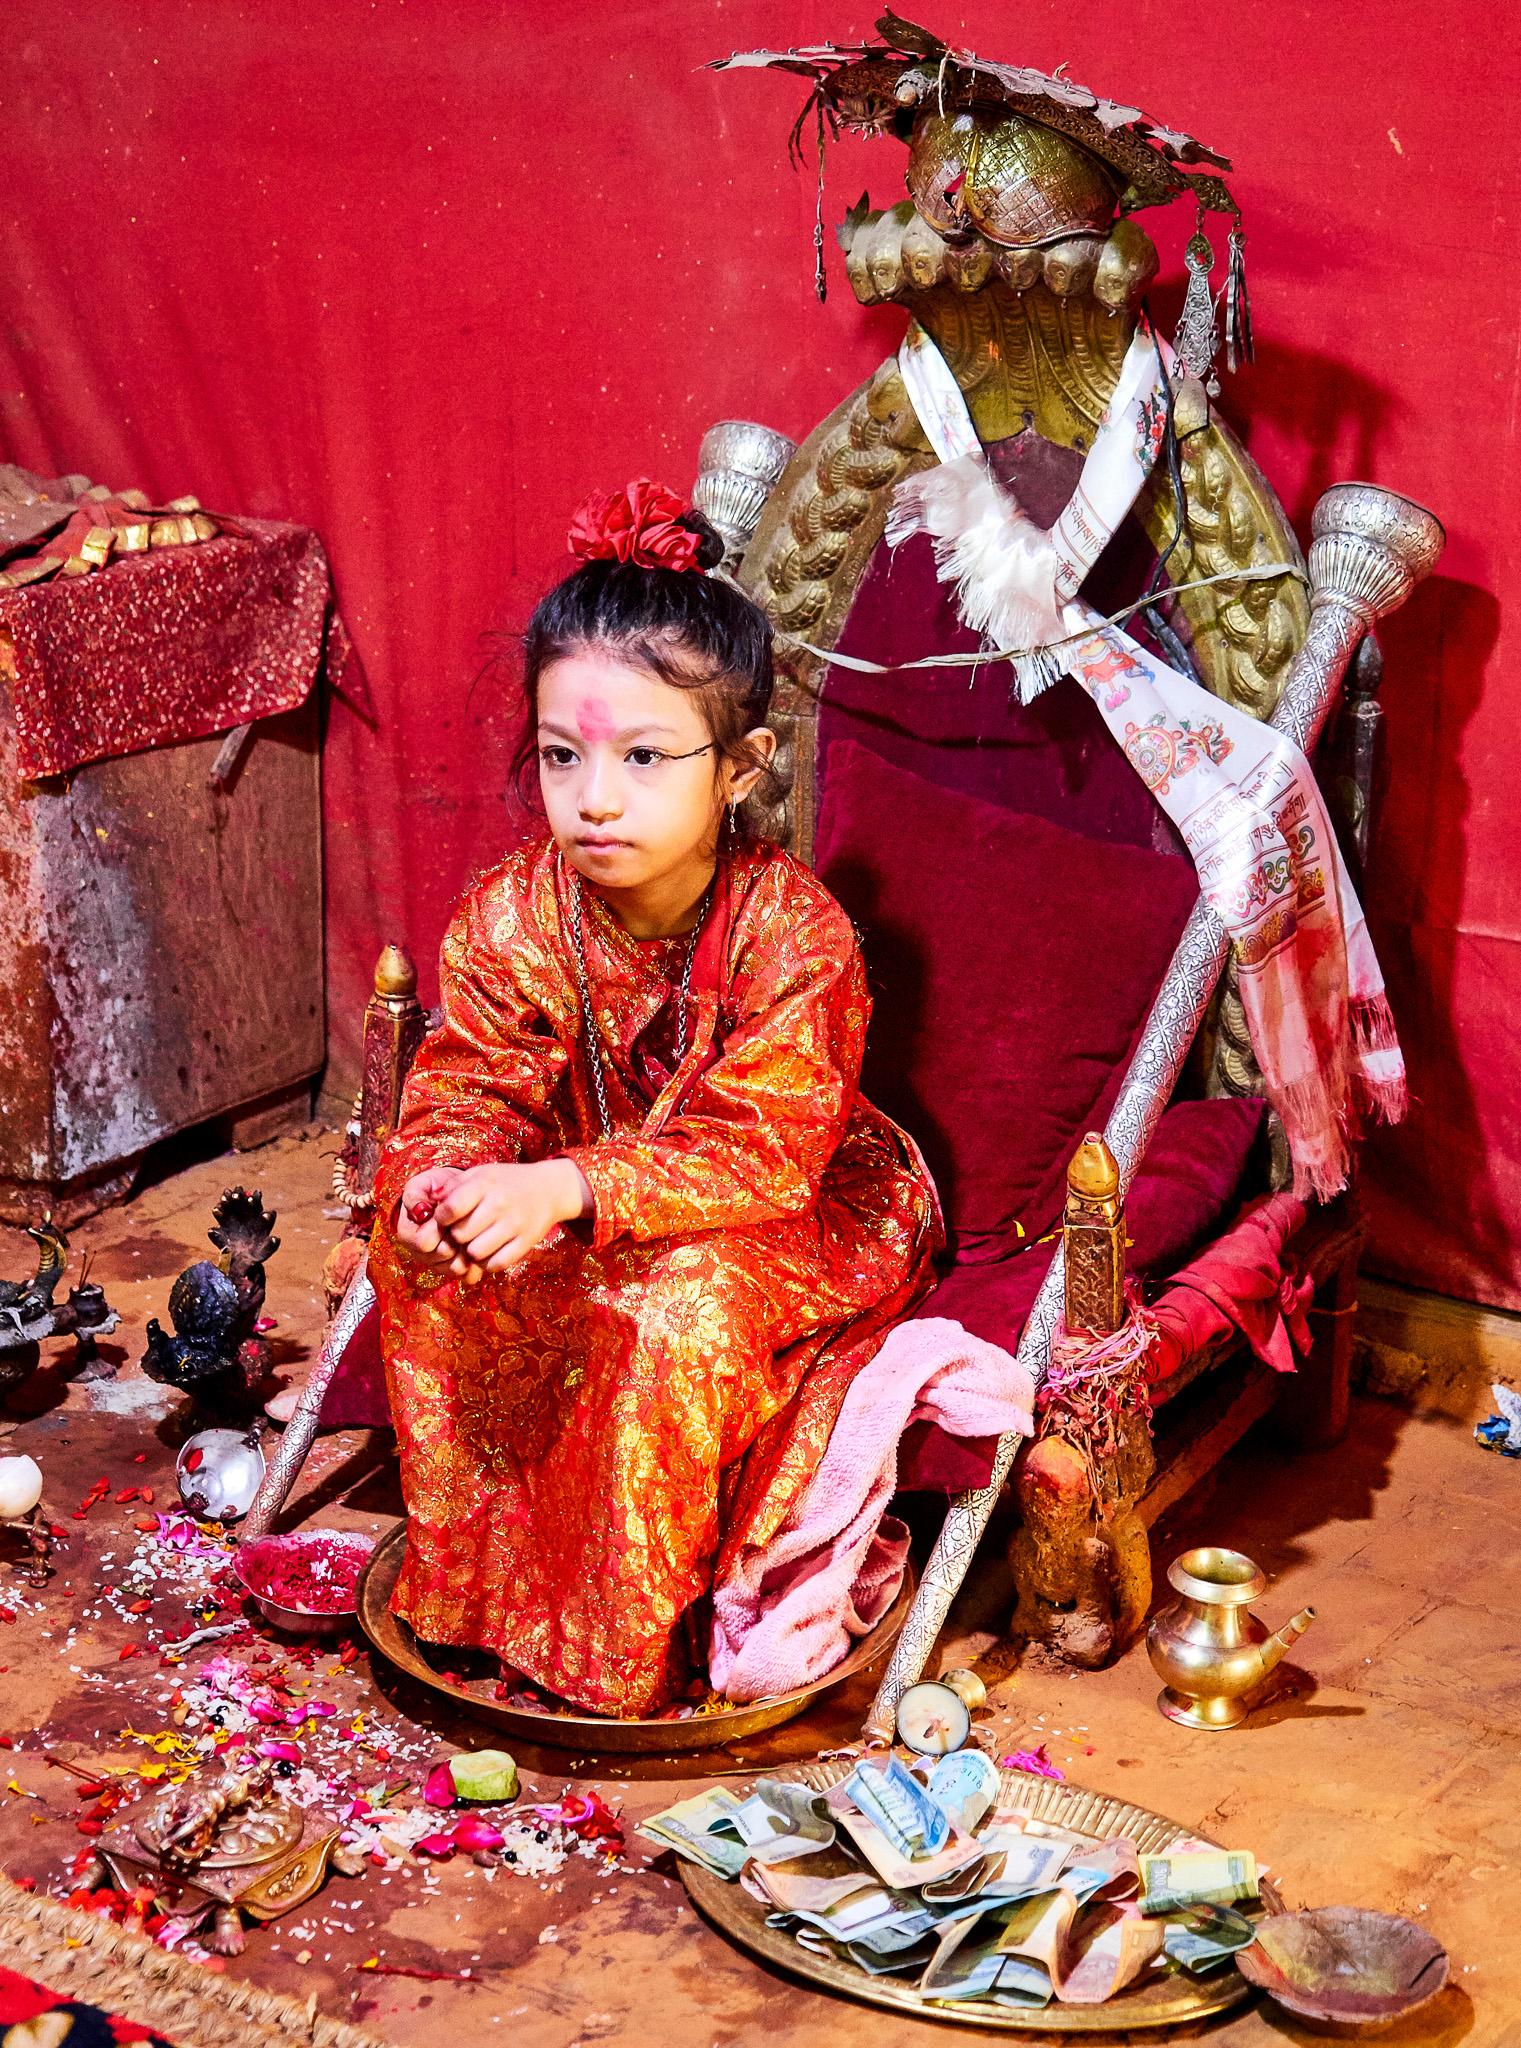 Lalitpur living Godess (Kumari) in her throne, Lalitpur, Kathmandu, Nepal